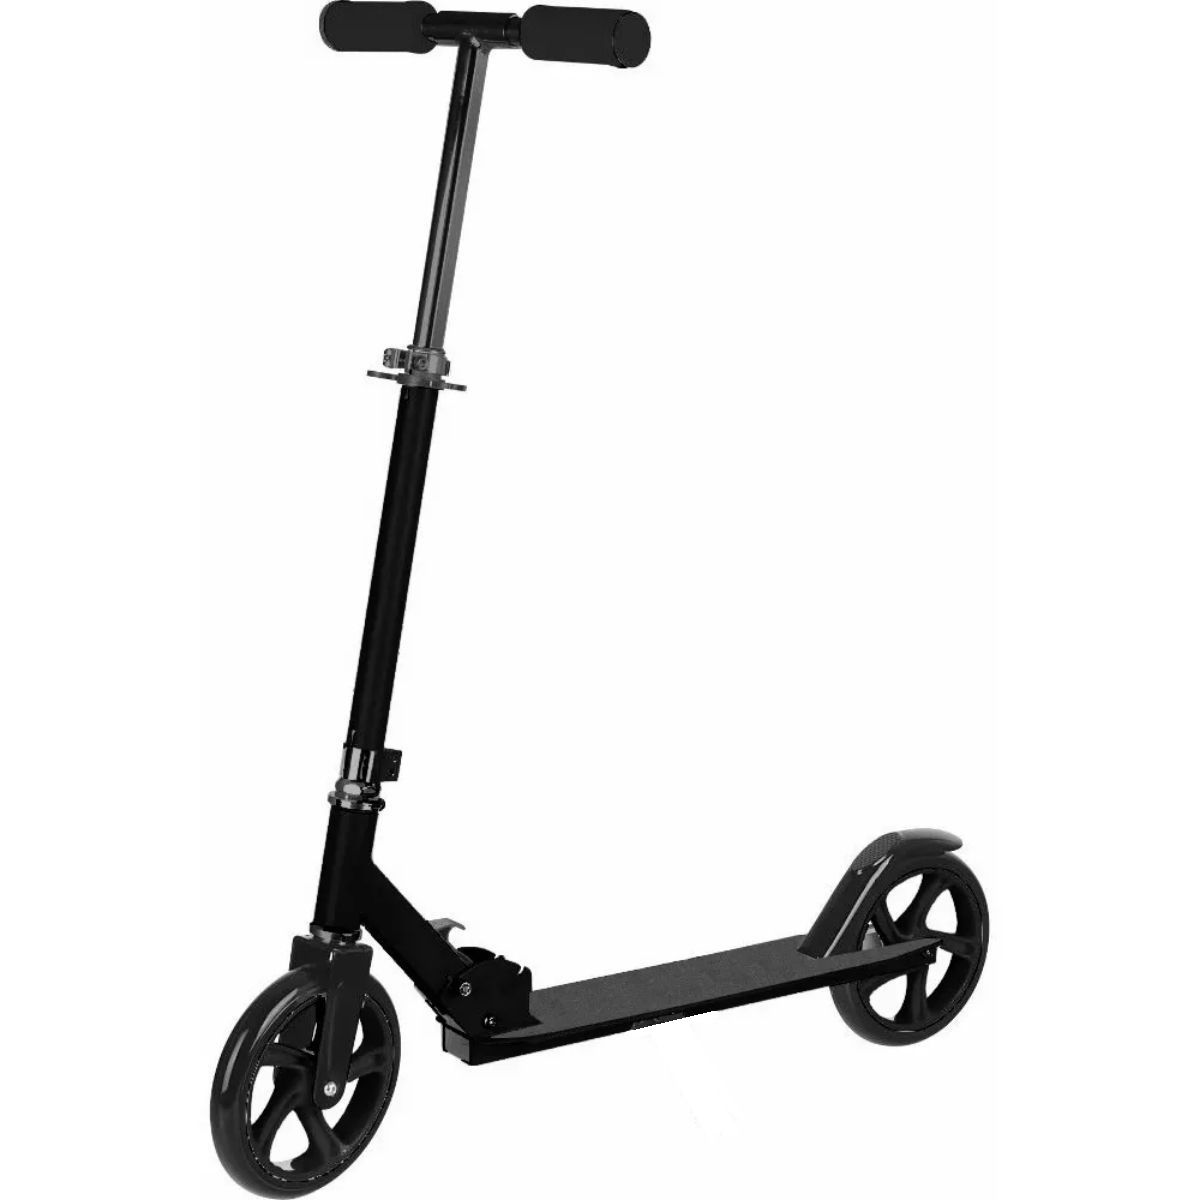 Patinete Adulto e Infantil Roda 200mm Preto Com 2 Rodas - YTA-663-BLACK